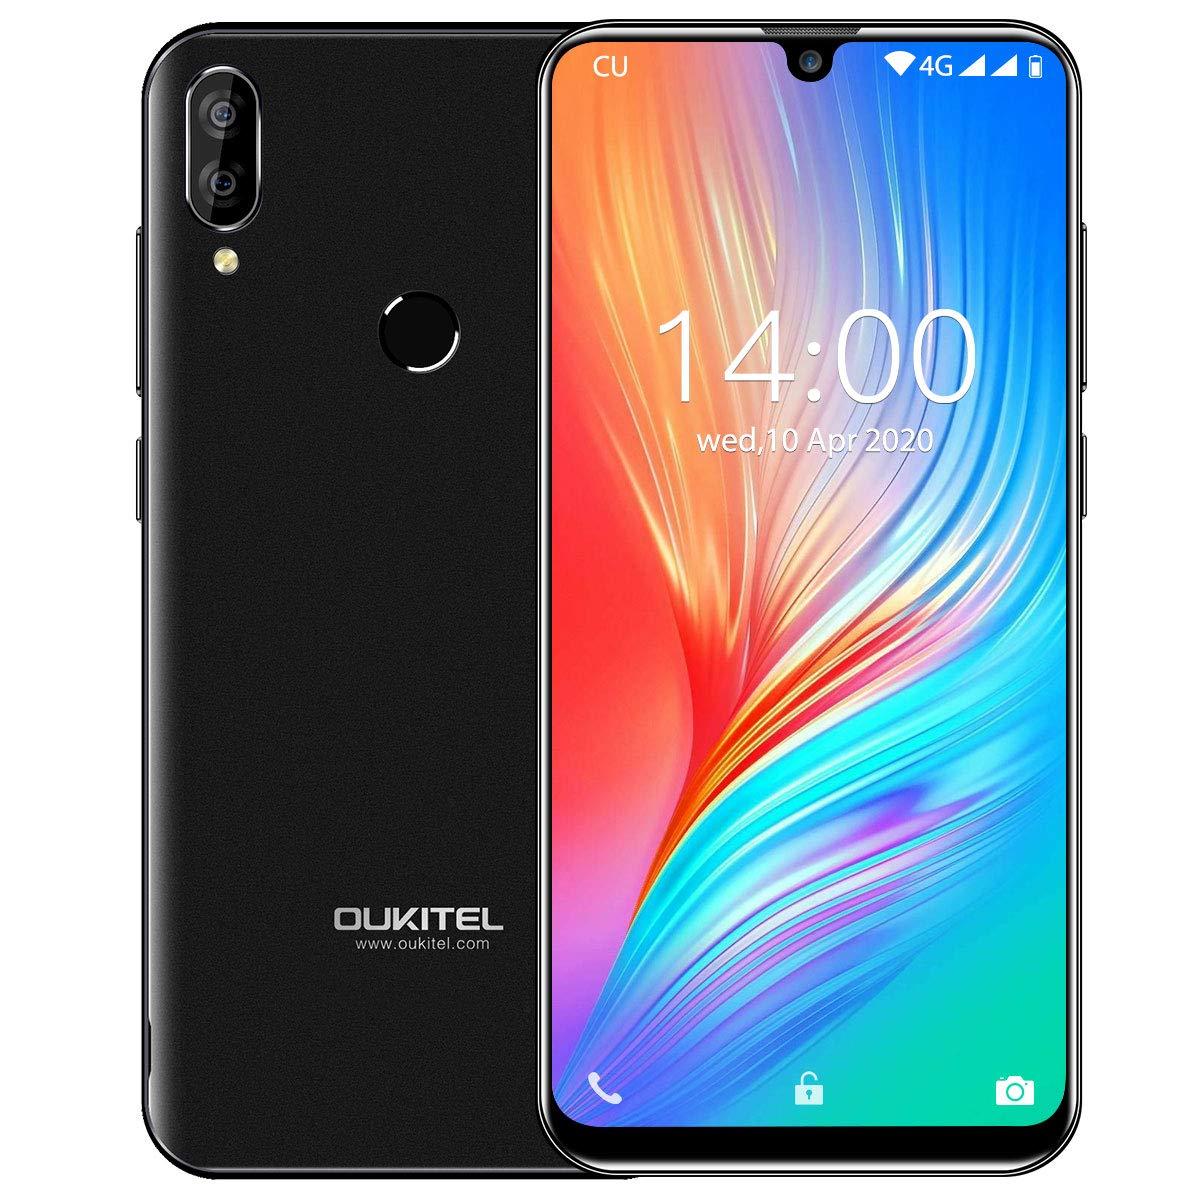 Smartphone Libre, OUKITEL C16 Pro Android 9.0 4G Dual SIM Telefonos Moviles, Pantalla de Gota de Agua de 5,71 Pulgadas Teléfono Movil,3300mAh Batería 32GB ROM Dual Cámaras Smartphone, Negro: Amazon.es: Electrónica